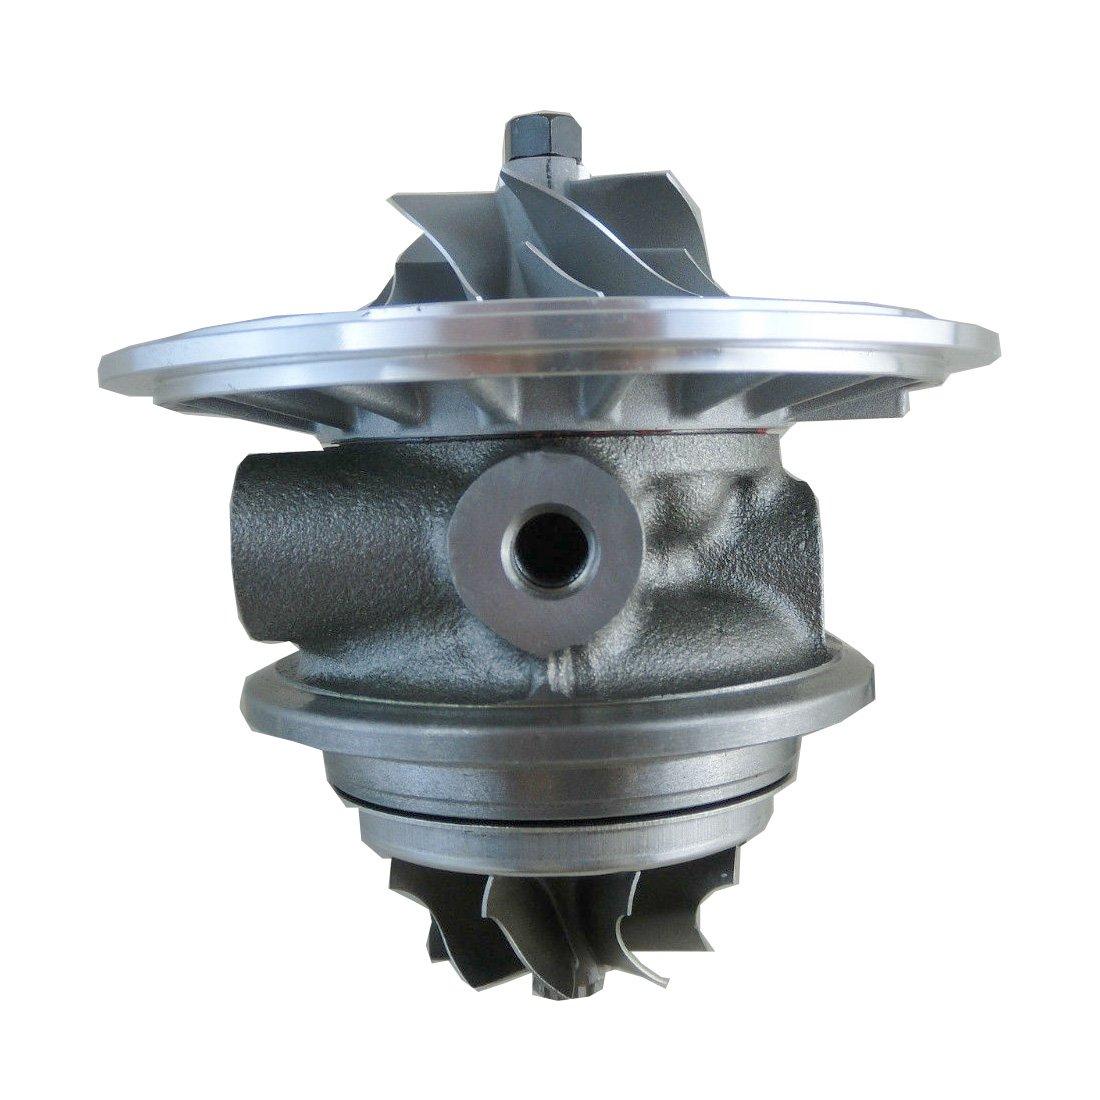 TKParts New Turbo Cartridge CHRA RHF5H VF40 14411-AA510 14411AA511 14411AA510 14411AA51A VA430083 For SUBARU Legacy-GT Outback-XT 05-09 2.5L